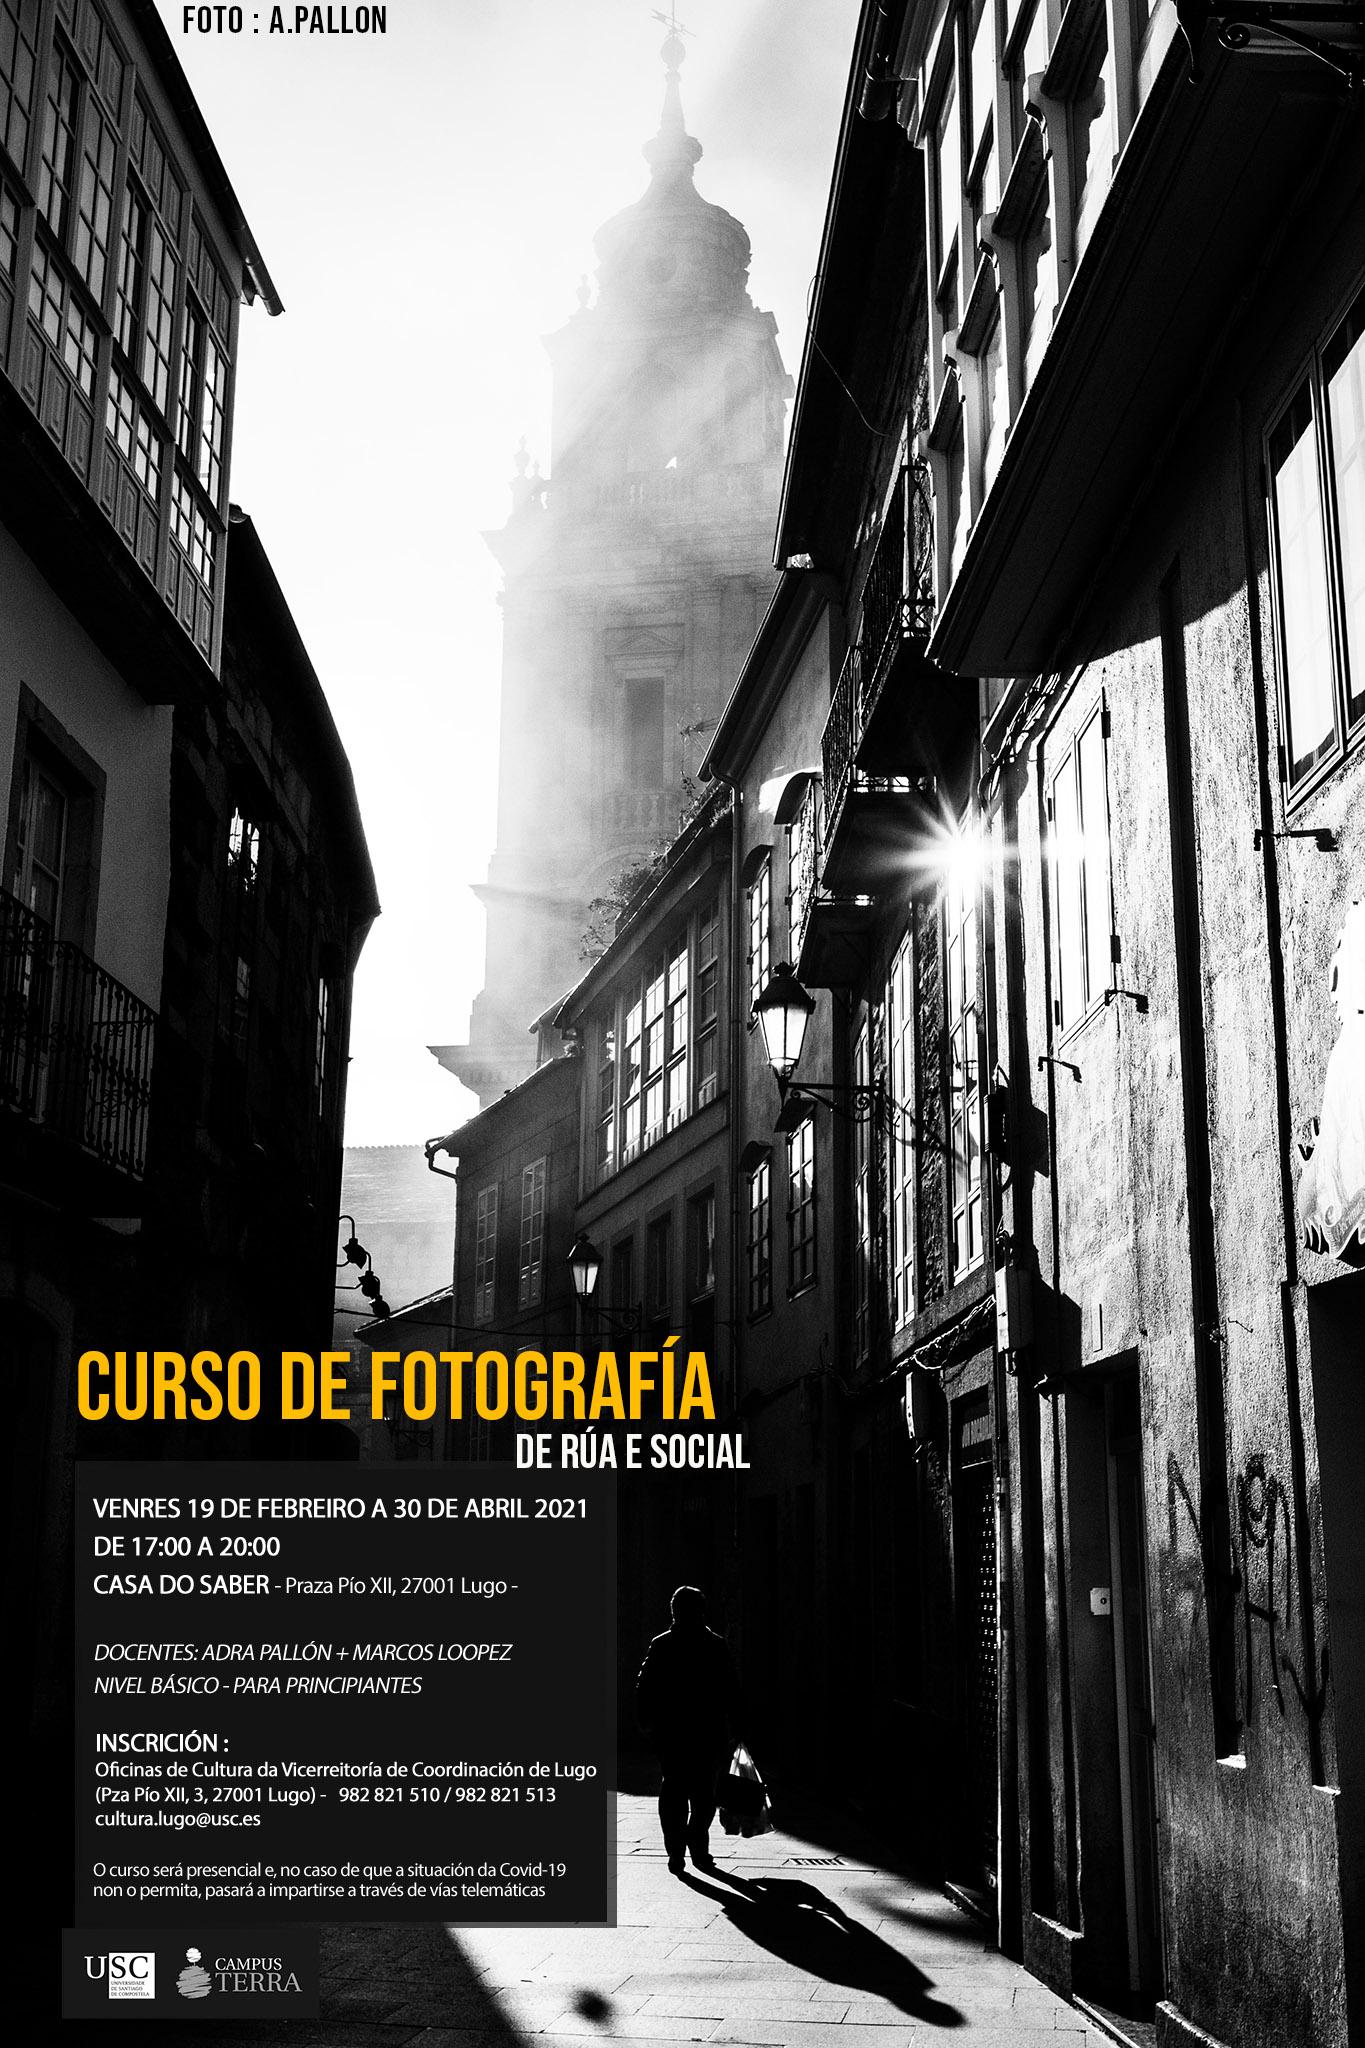 Novo curso básico de fotografía da área de cultura da USC Lugo